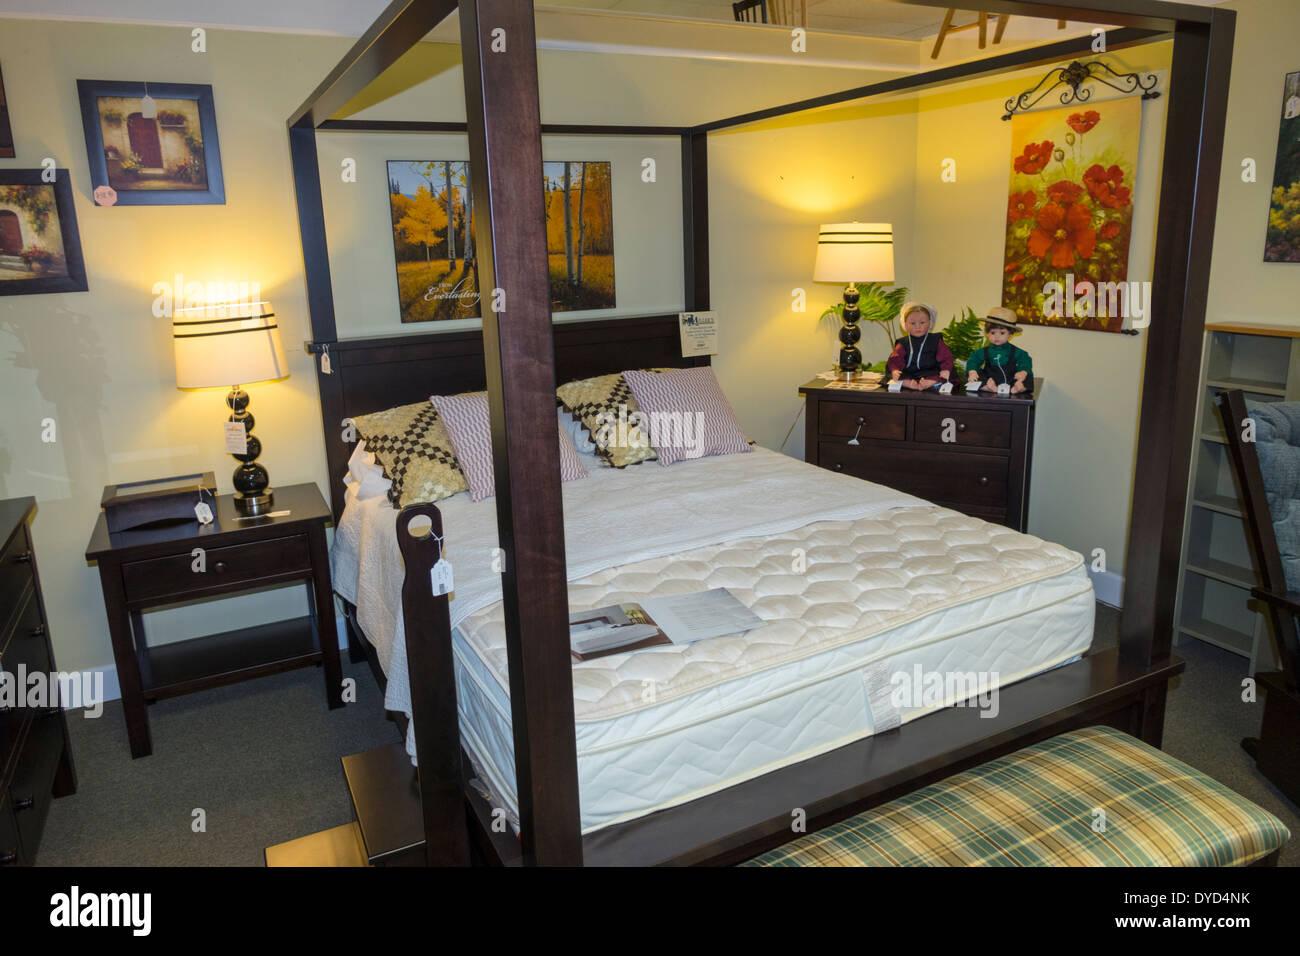 Dorable Muebles De Sarasota Componente - Muebles Para Ideas de ...